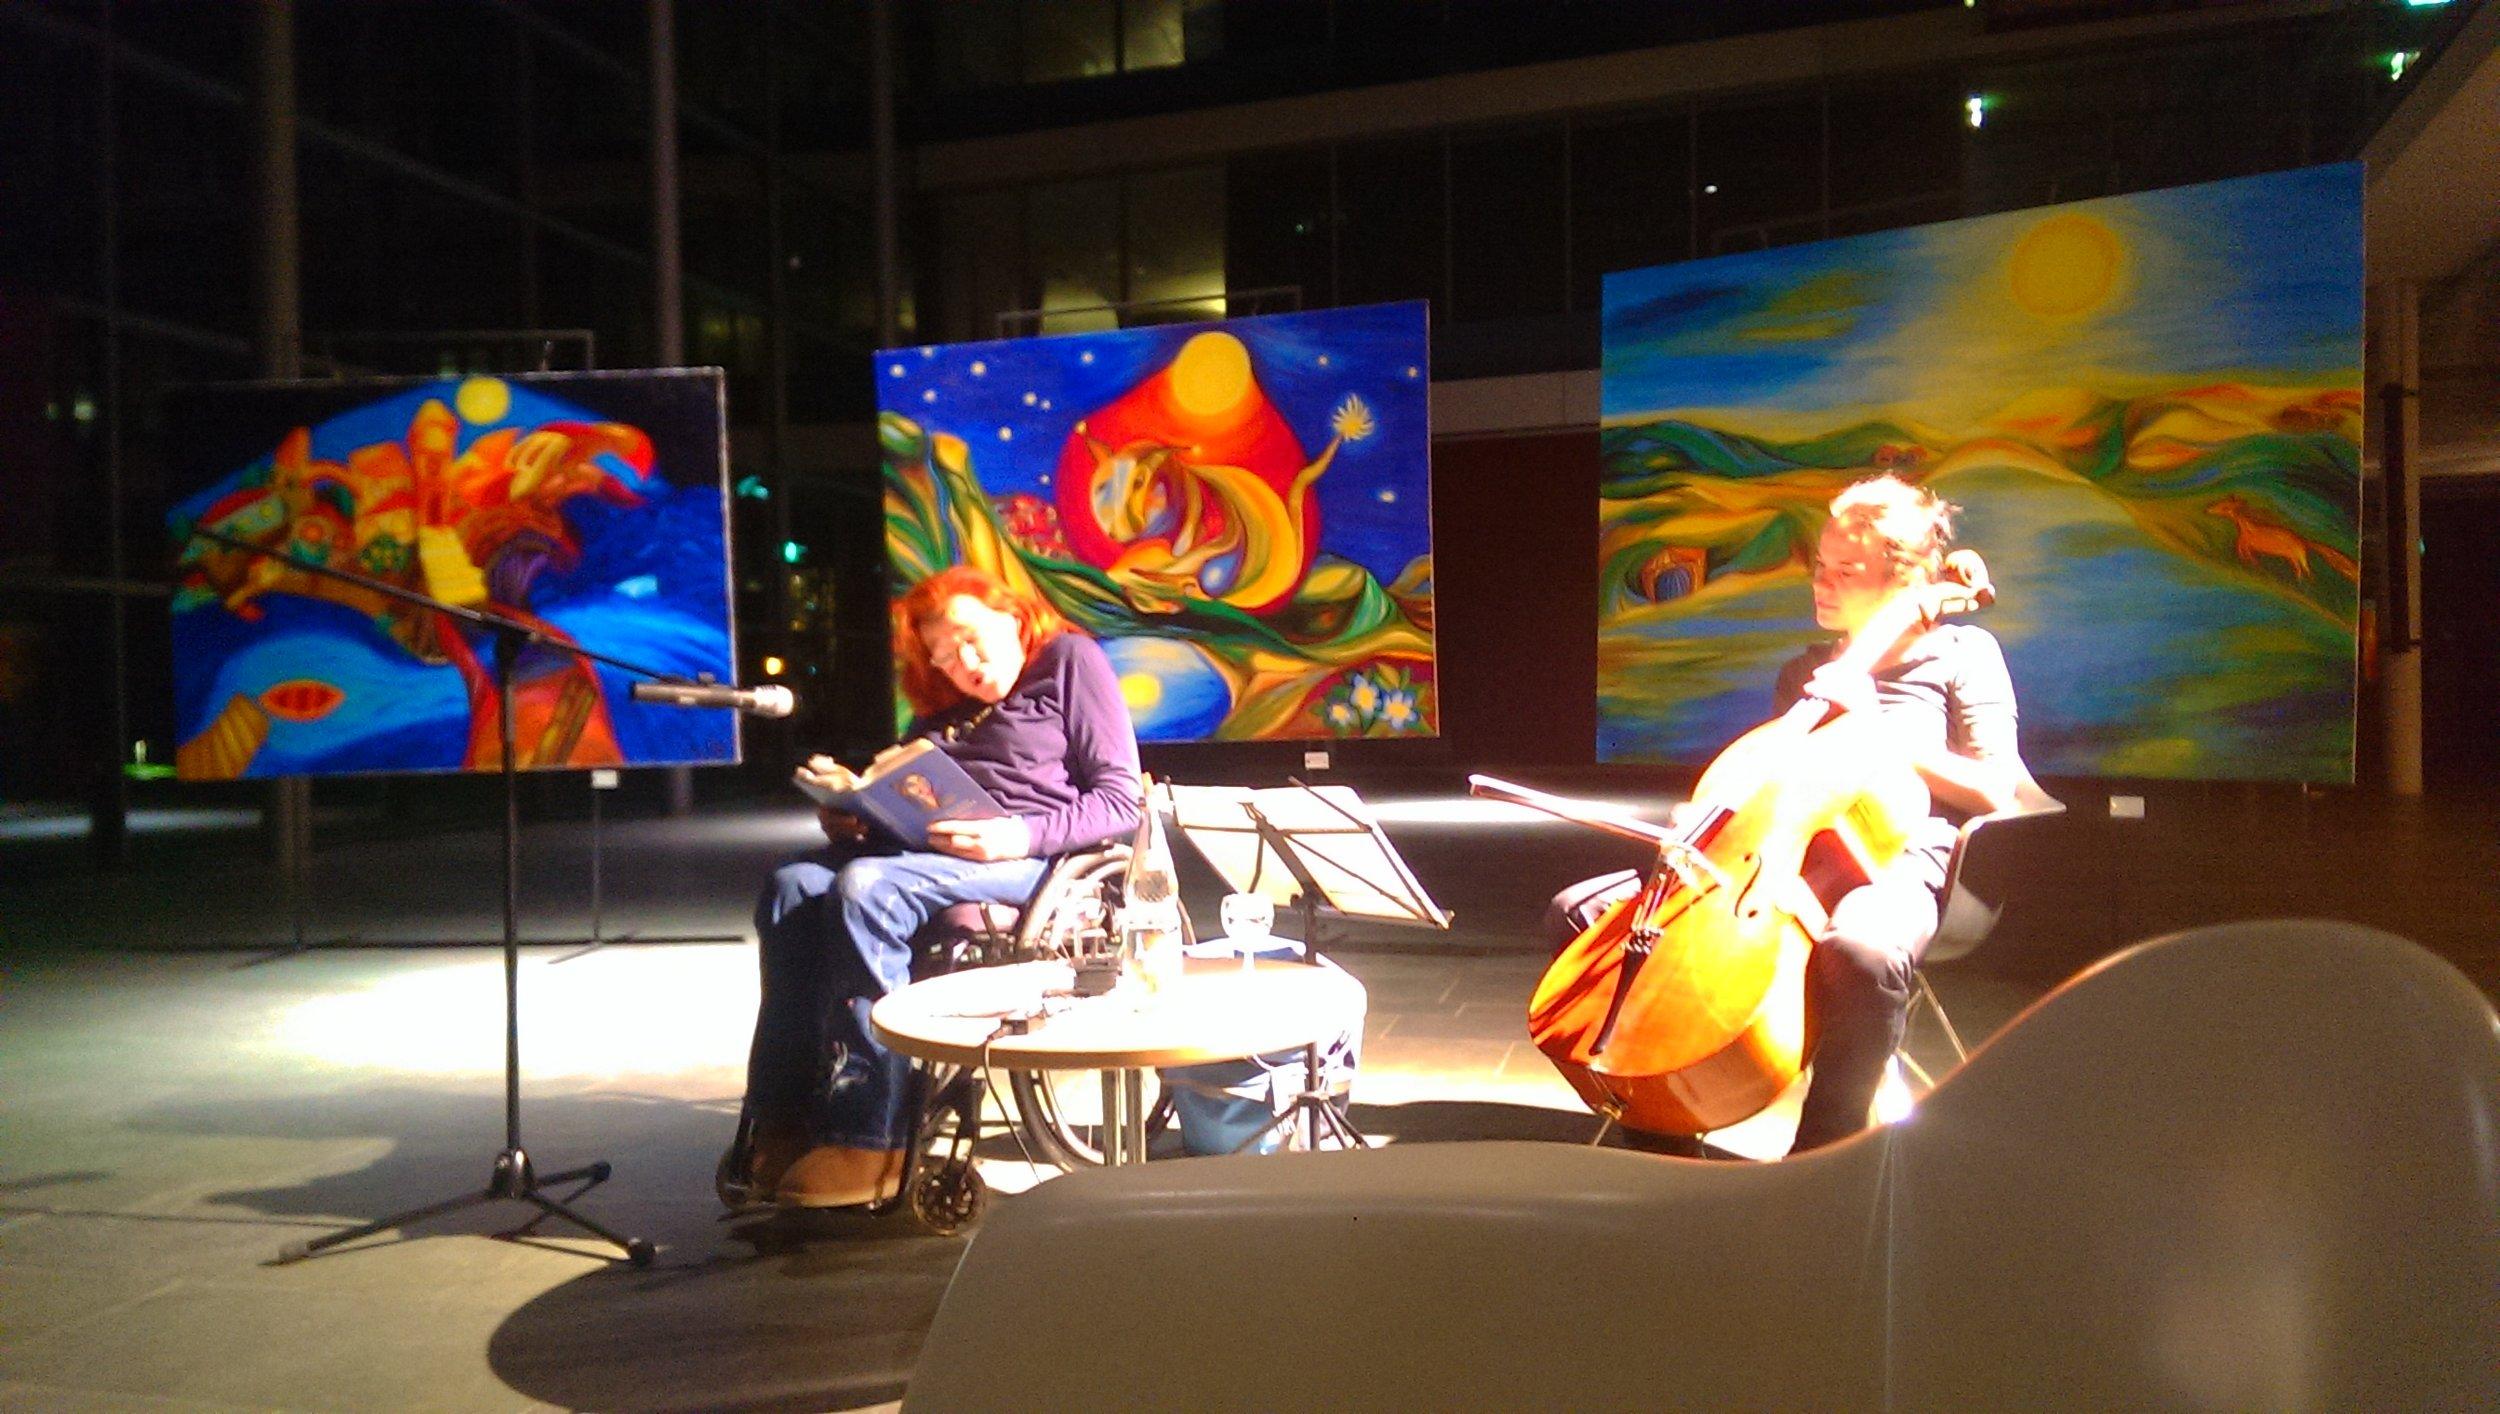 Lesung - Anne-Marie Salome BrennerMusik: Elisa Herbig (Violoncello)28.11.2017 in der Glashalle des Landratsamts Tübingen